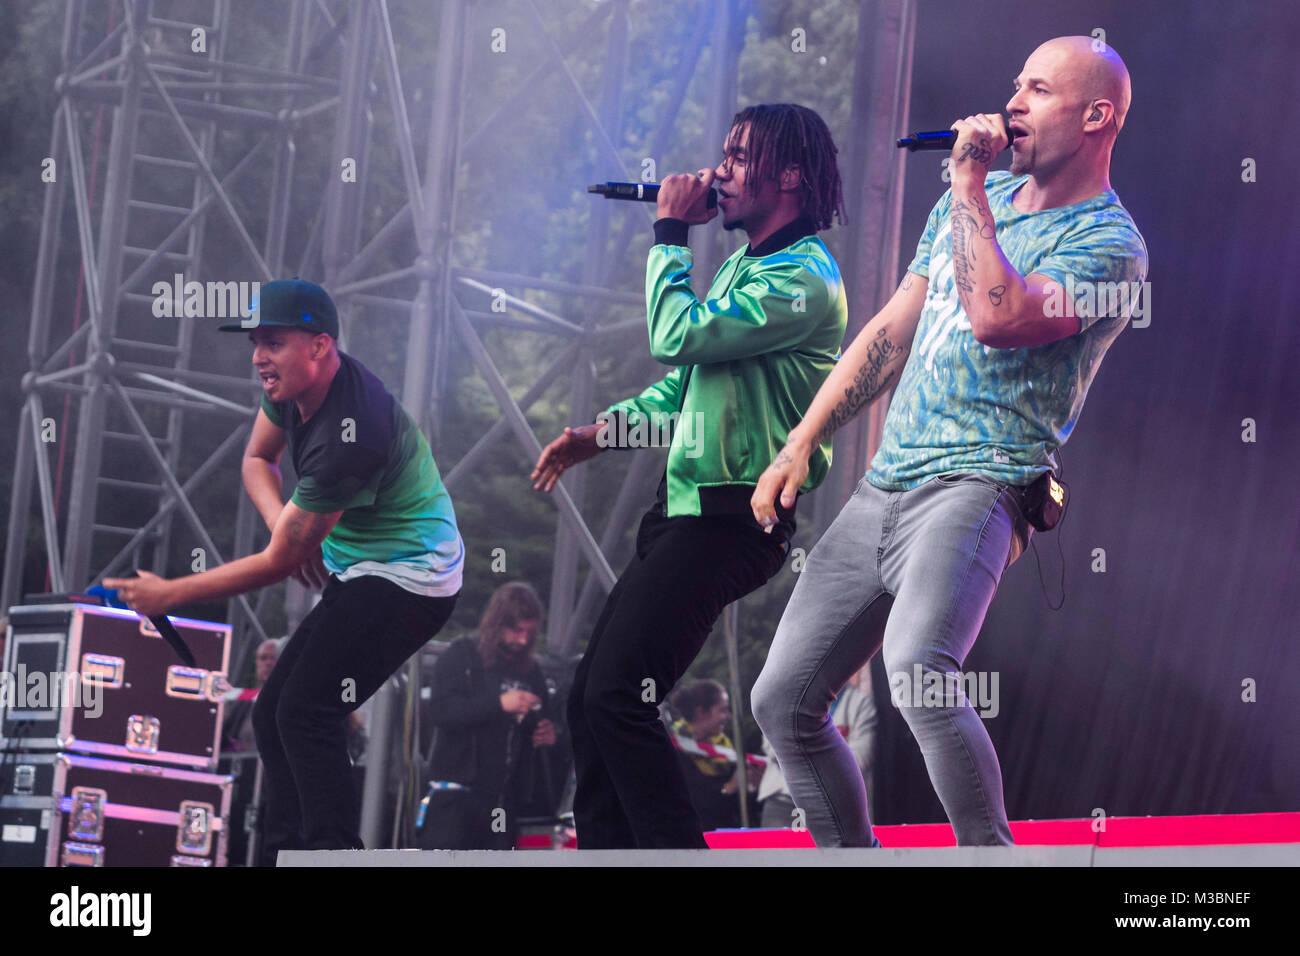 Culcha Candela ( Hip-Hop-Band ) beim 94,3 rs2 Sommerfestival am 16. August 2014 in der Berliner  Kindl-Bühne Wuhlheide. Stock Photo